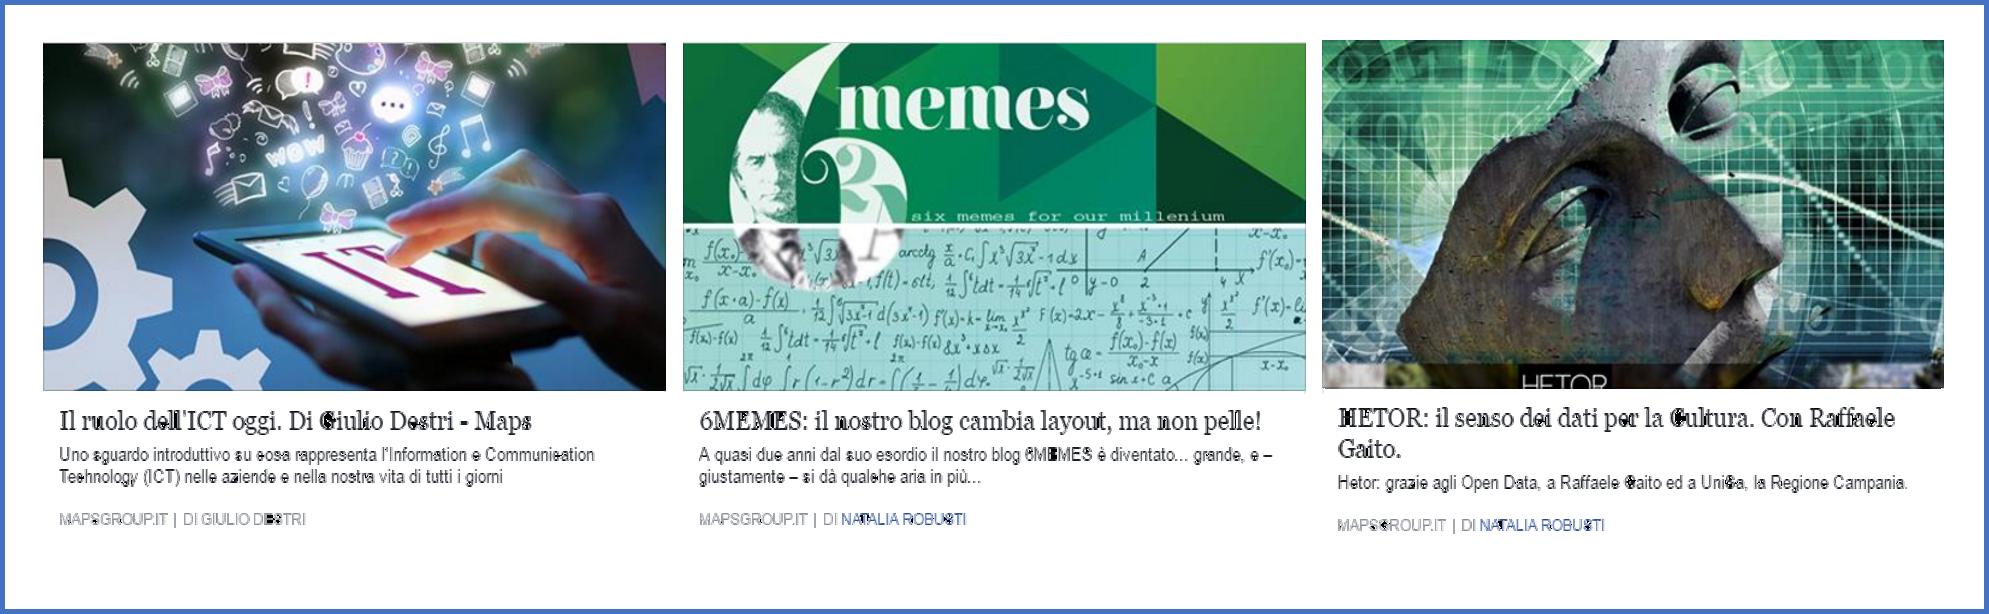 Imm6memes-gen-mar14